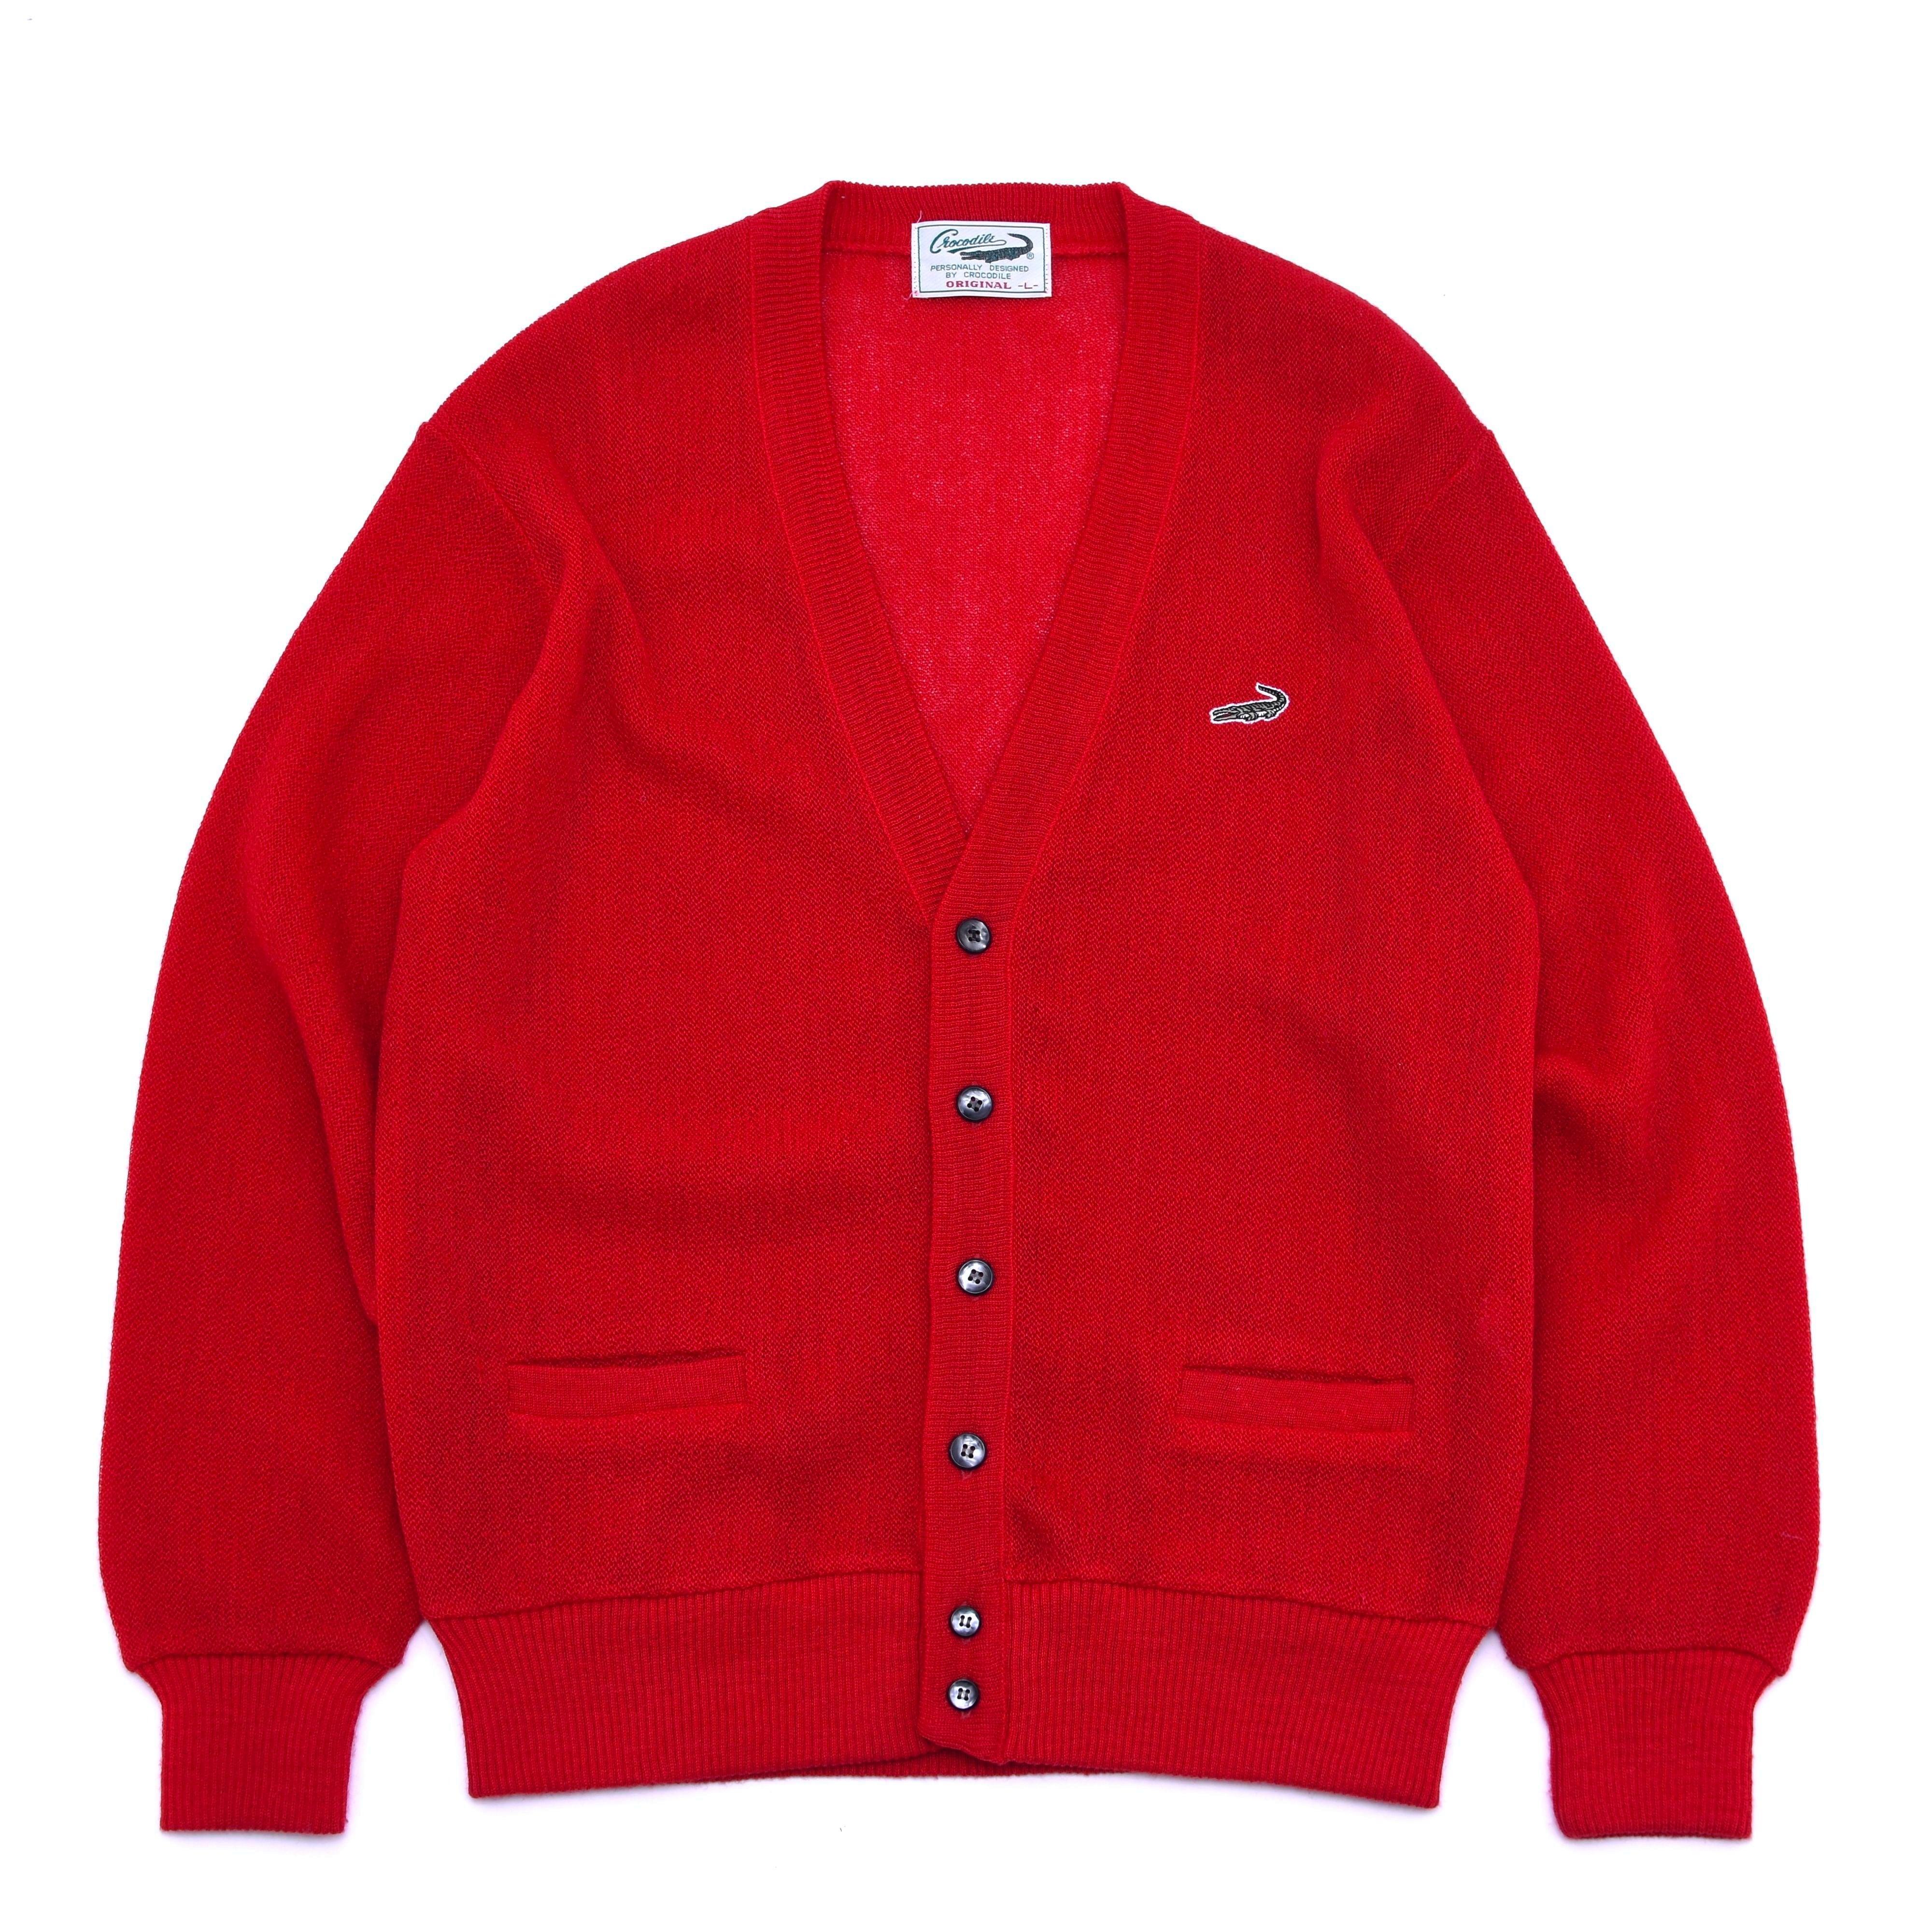 Red acrylic knit cardigan